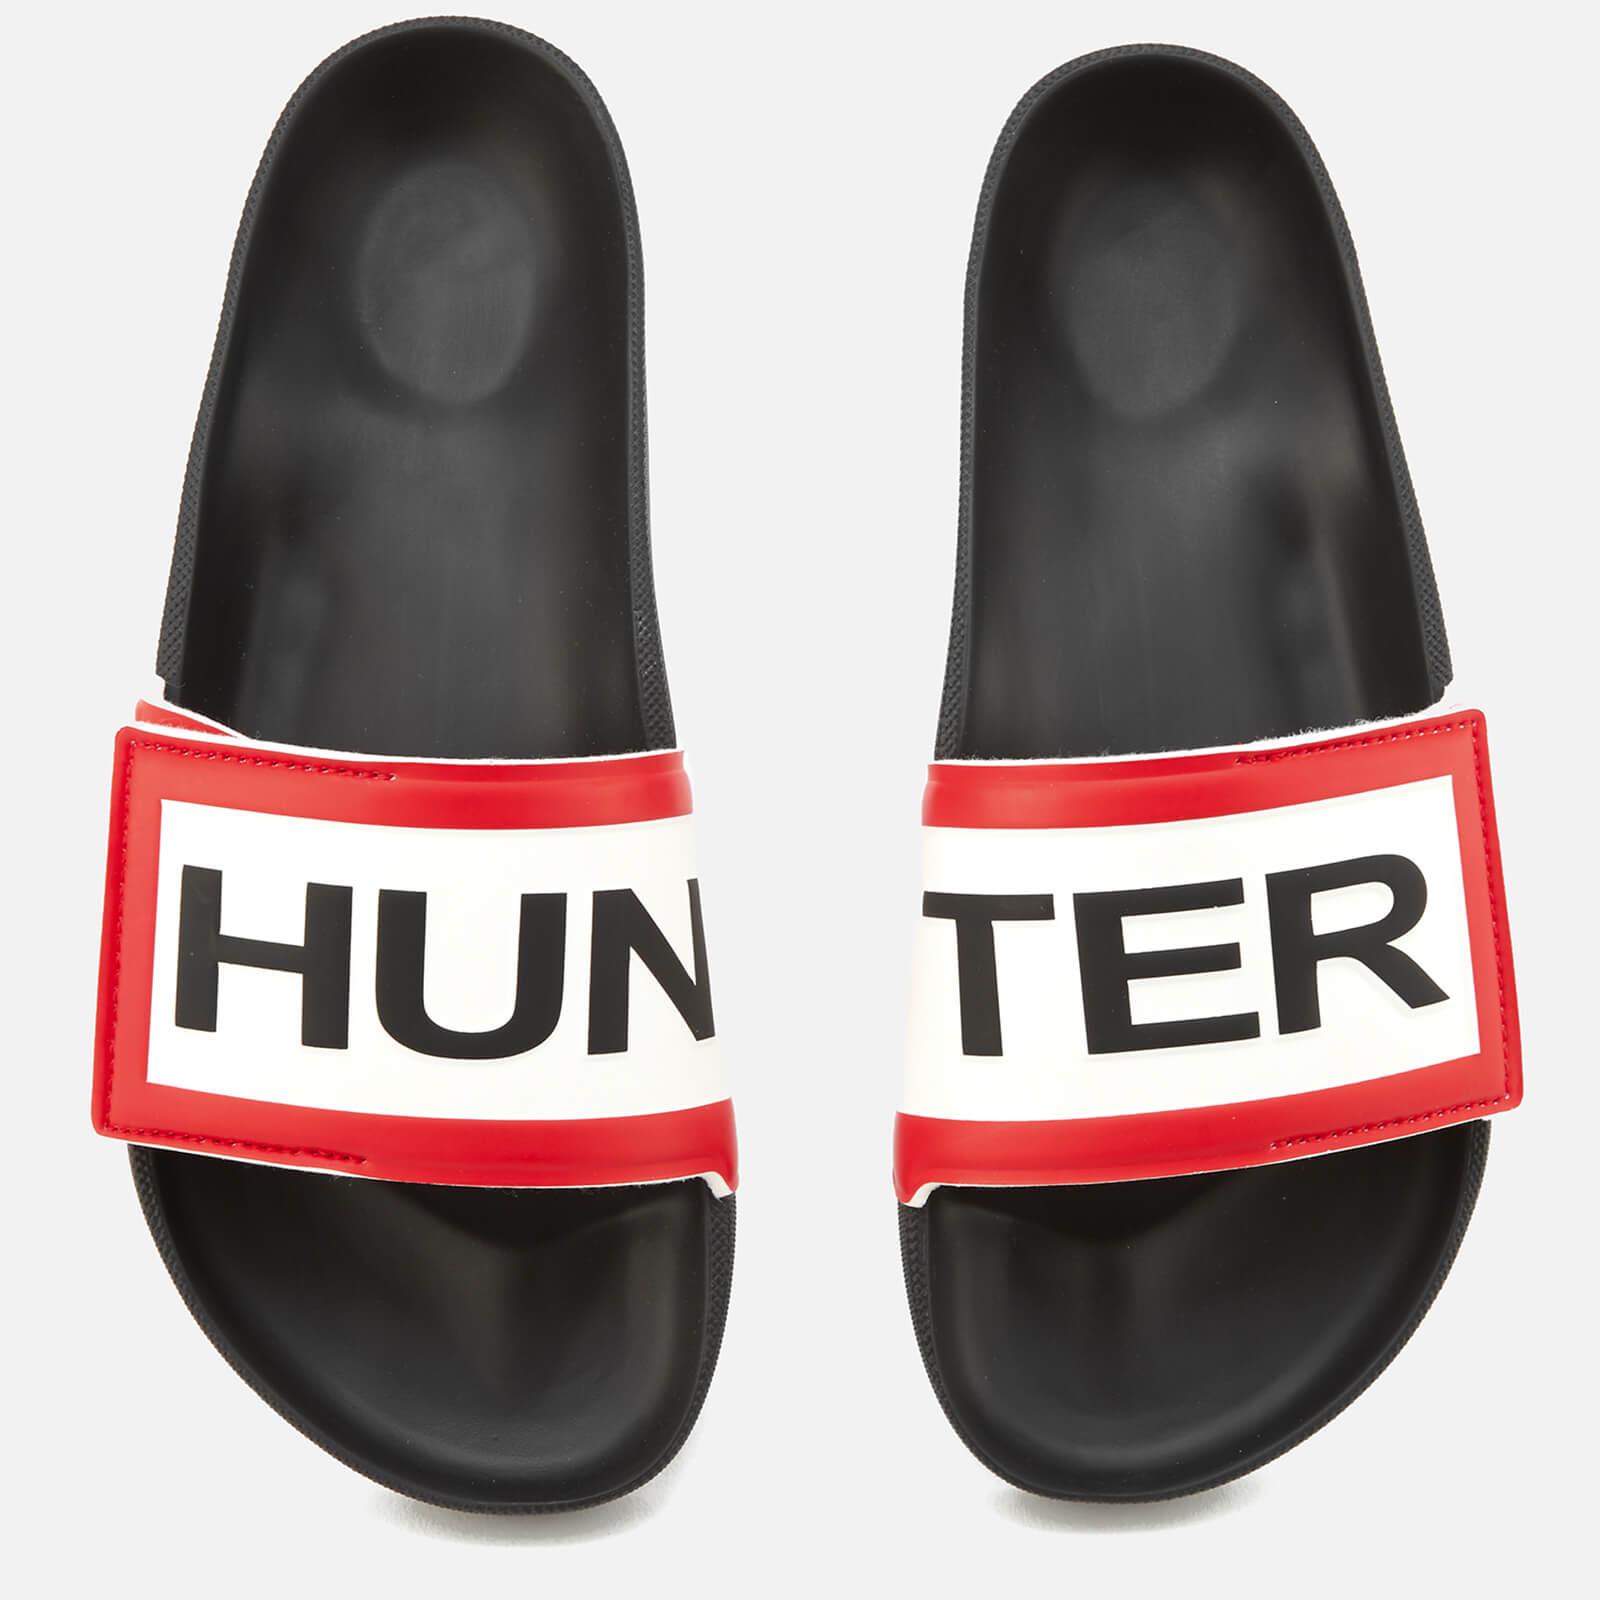 a38513a69 Hunter Men's Original Adjustable Logo Slide Sandals - Black Mens Footwear |  TheHut.com